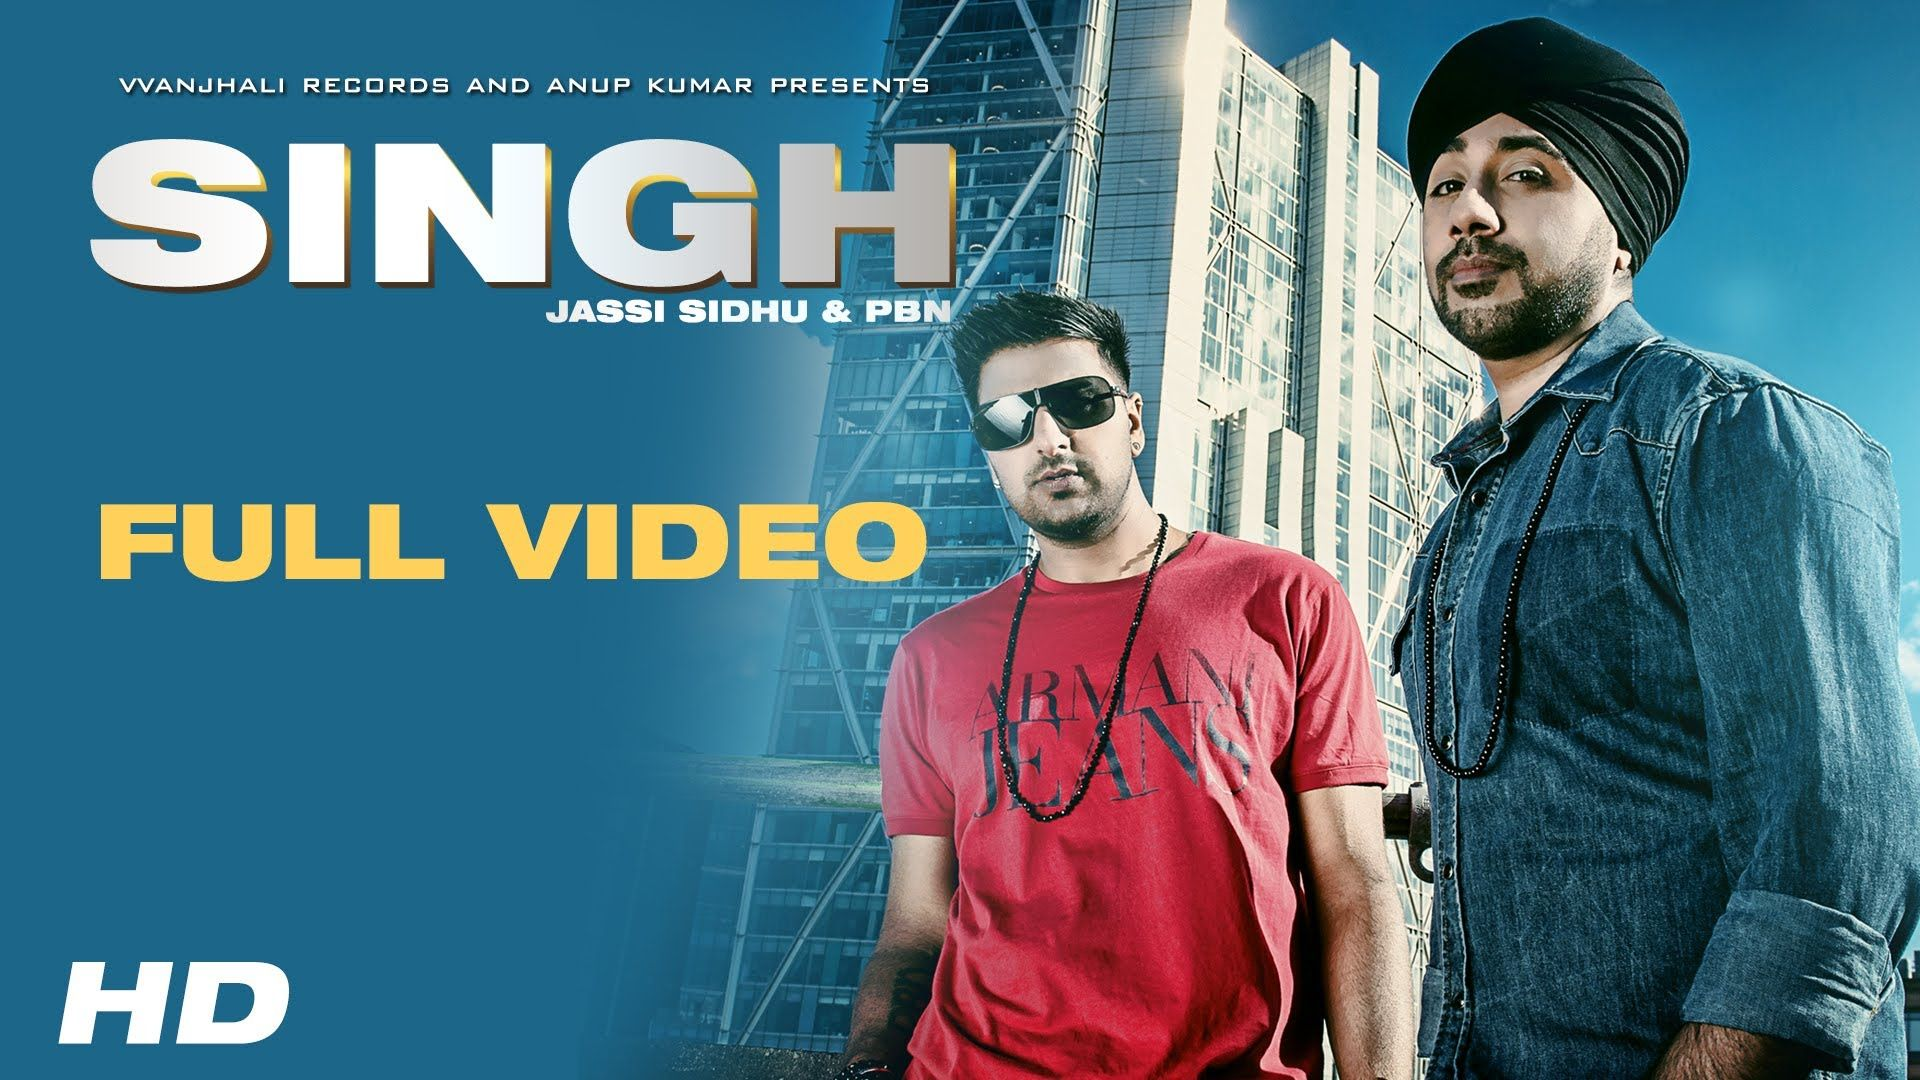 Pin by Bad Jatt on Punjabi Music   Mens tops, Me me me song, Latest